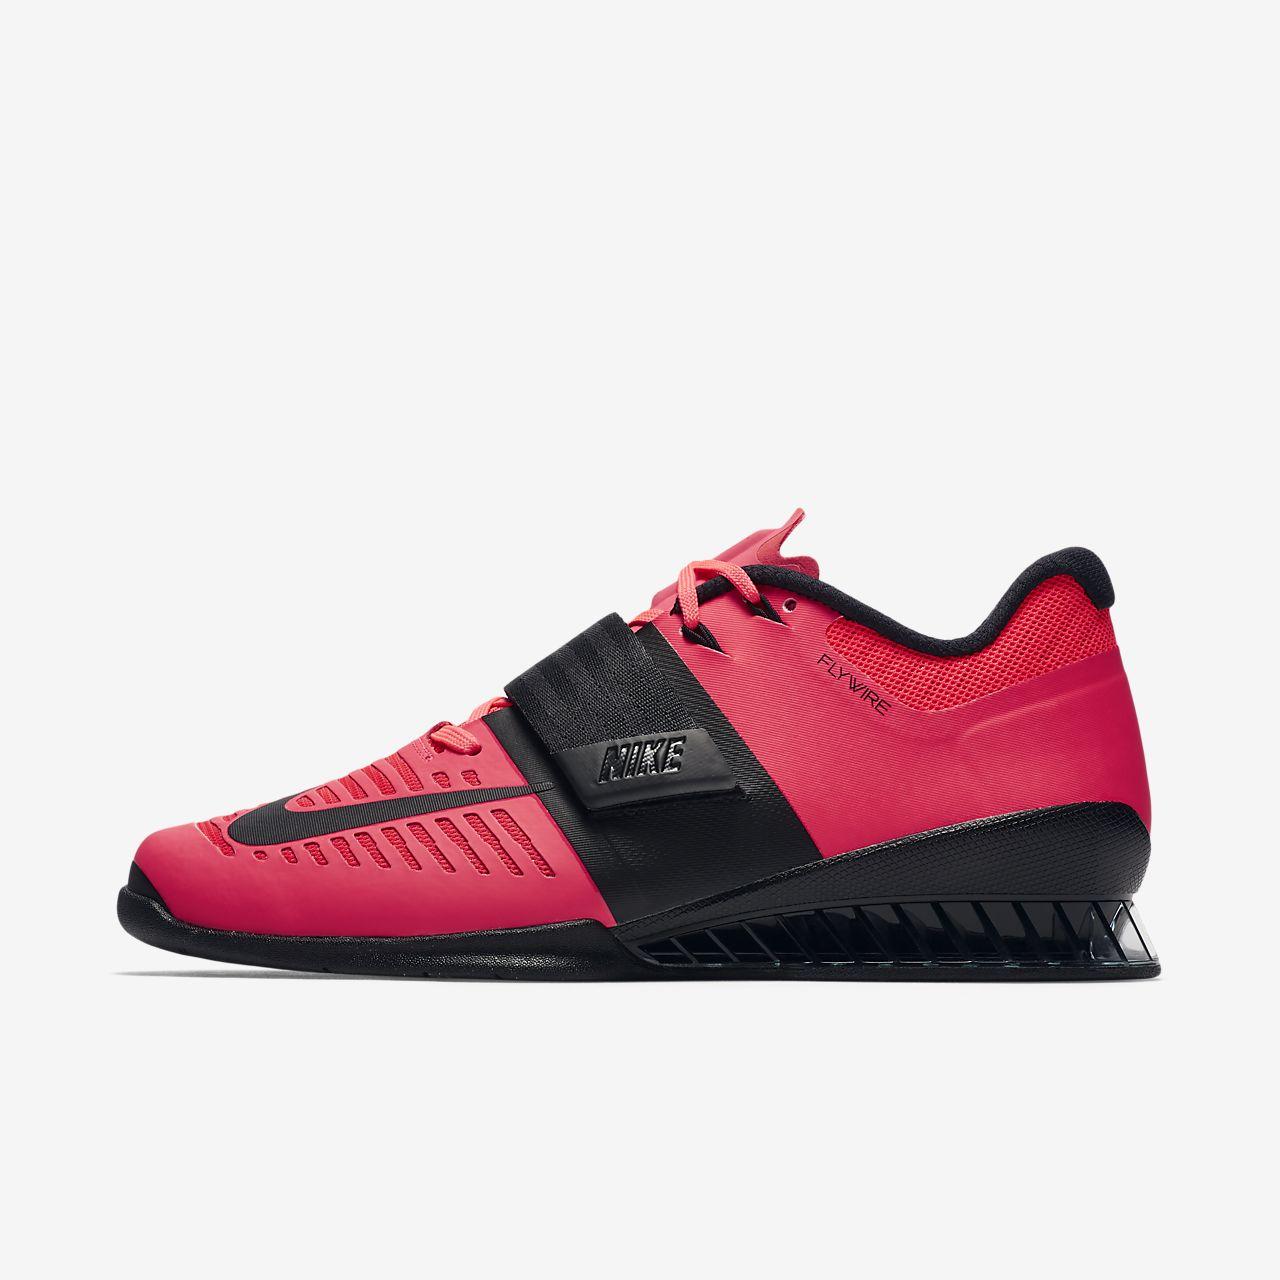 best service f8046 2b1af ... Chaussure de renforcement musculaire Nike Romaleos 3